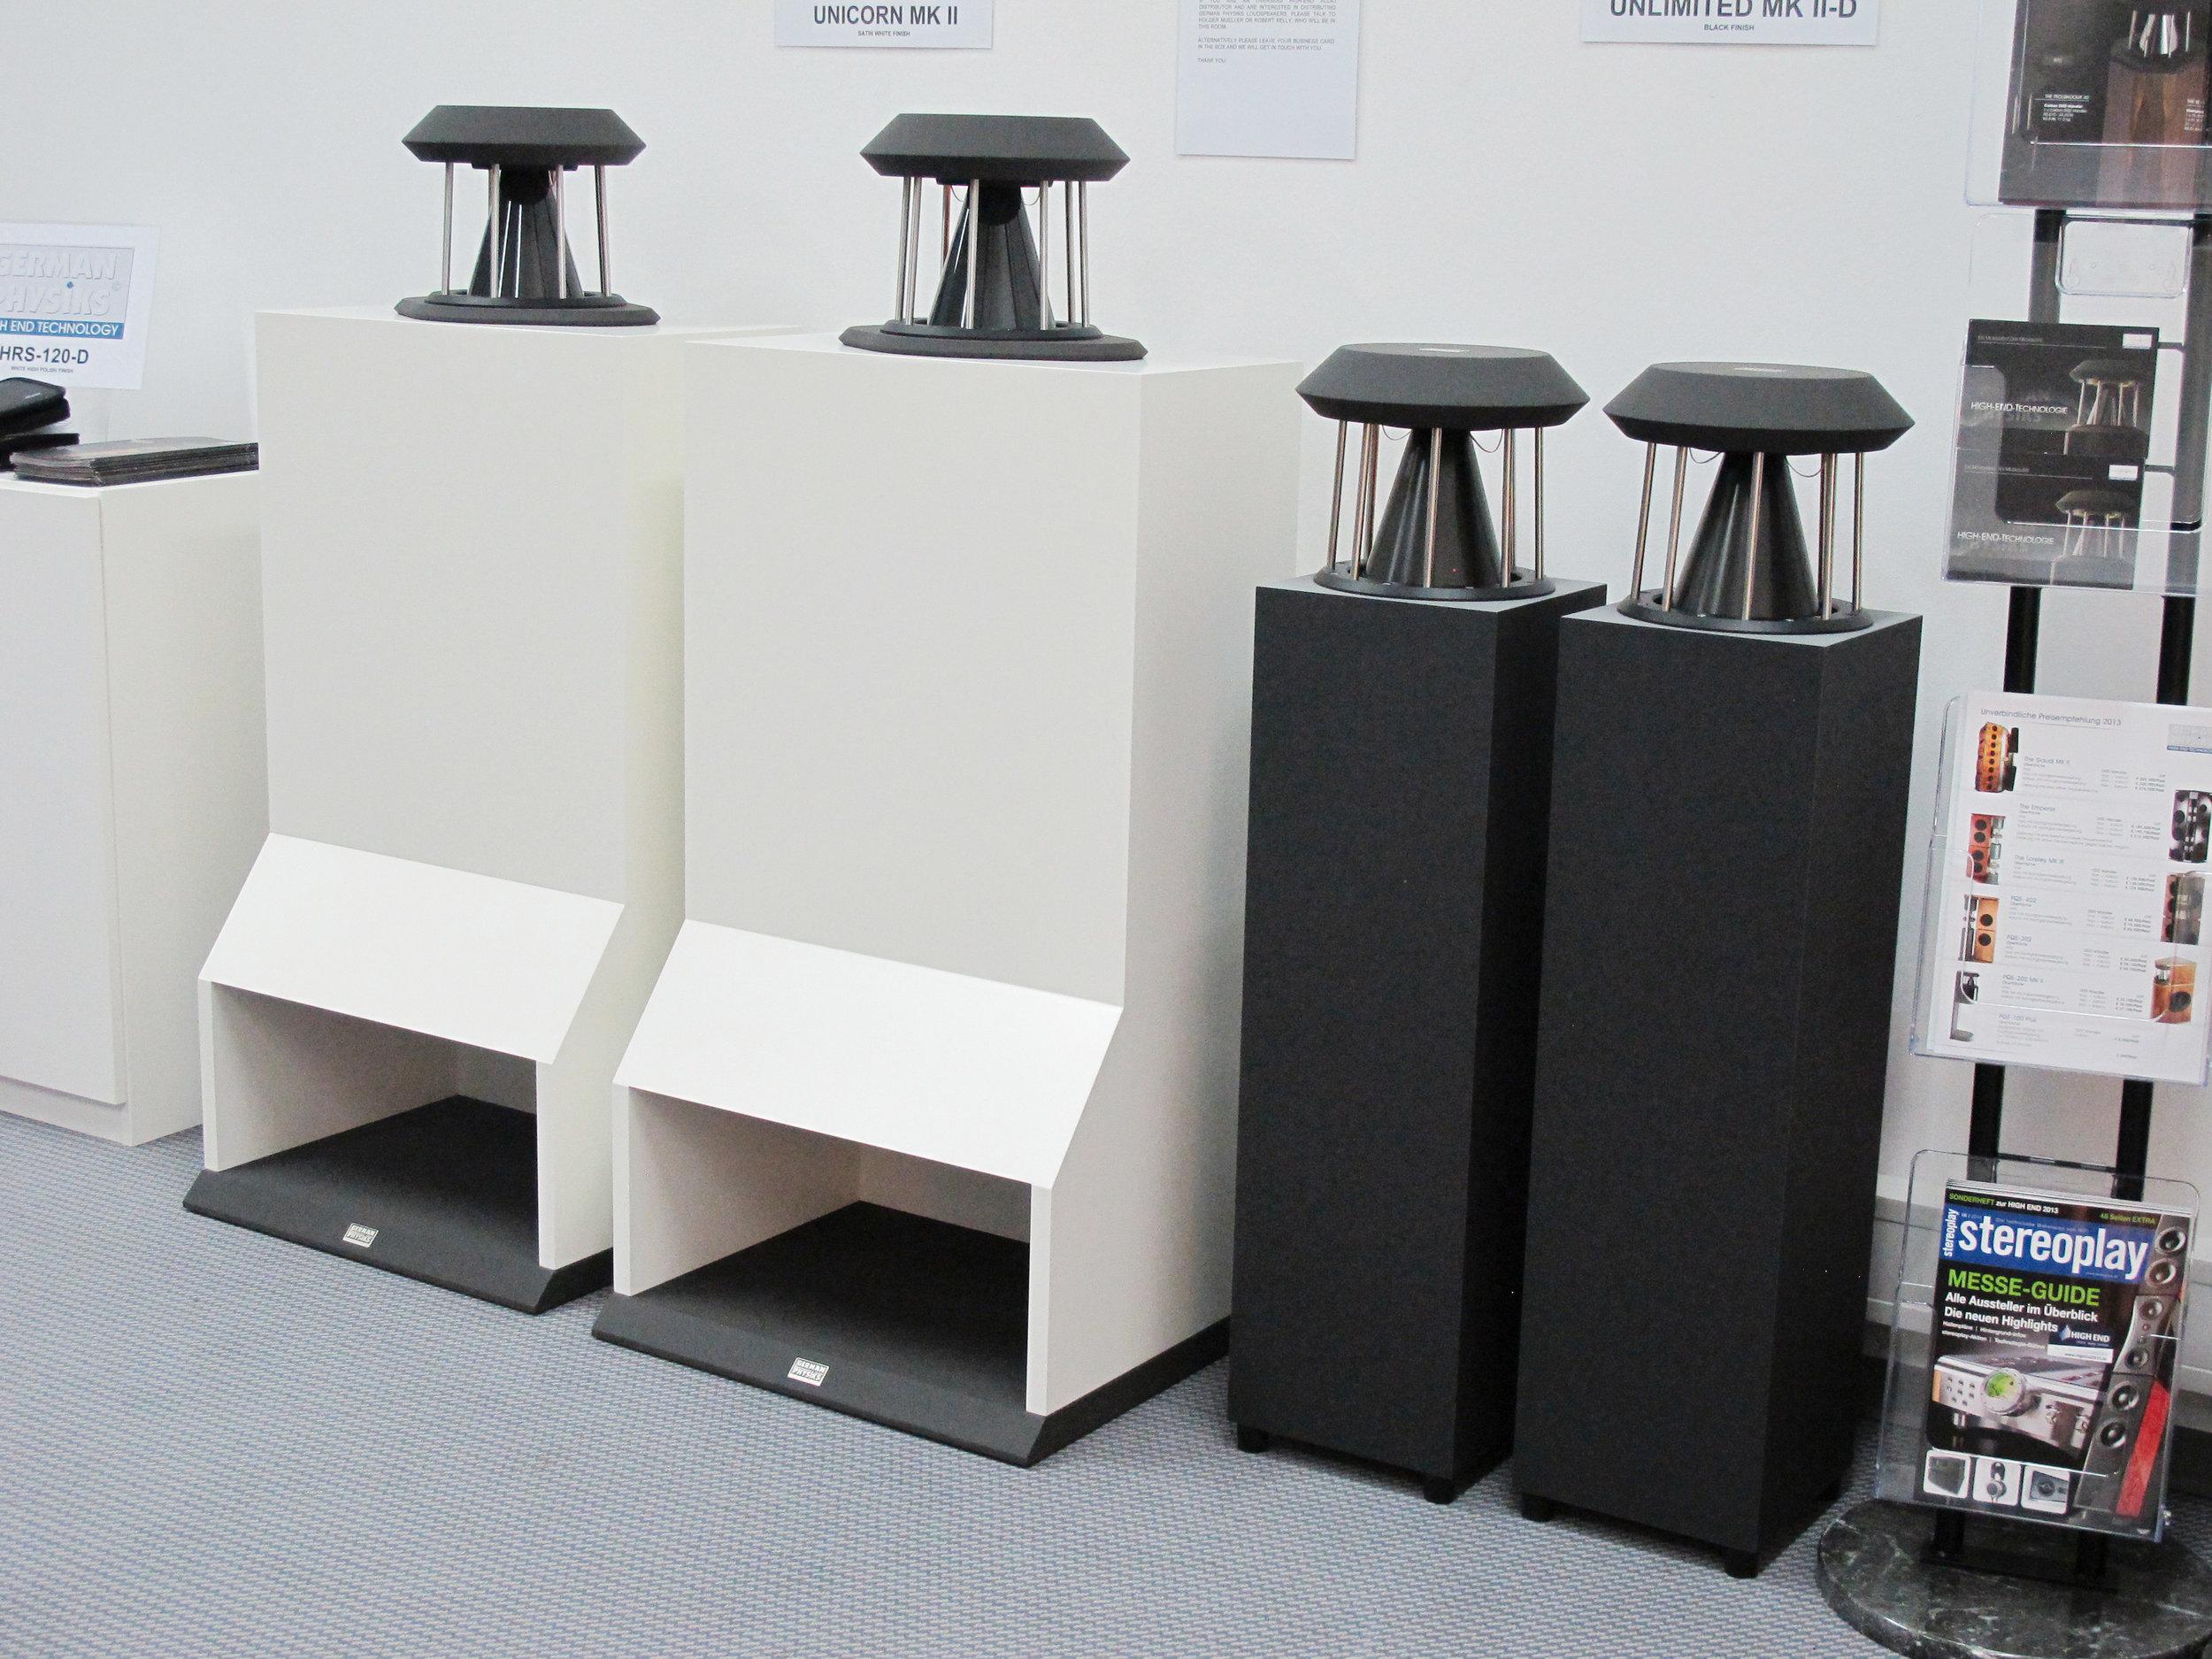 Unicorn MK II and Unlimited loudspeakers | Munich Hi-Fi Show 2013, Germany